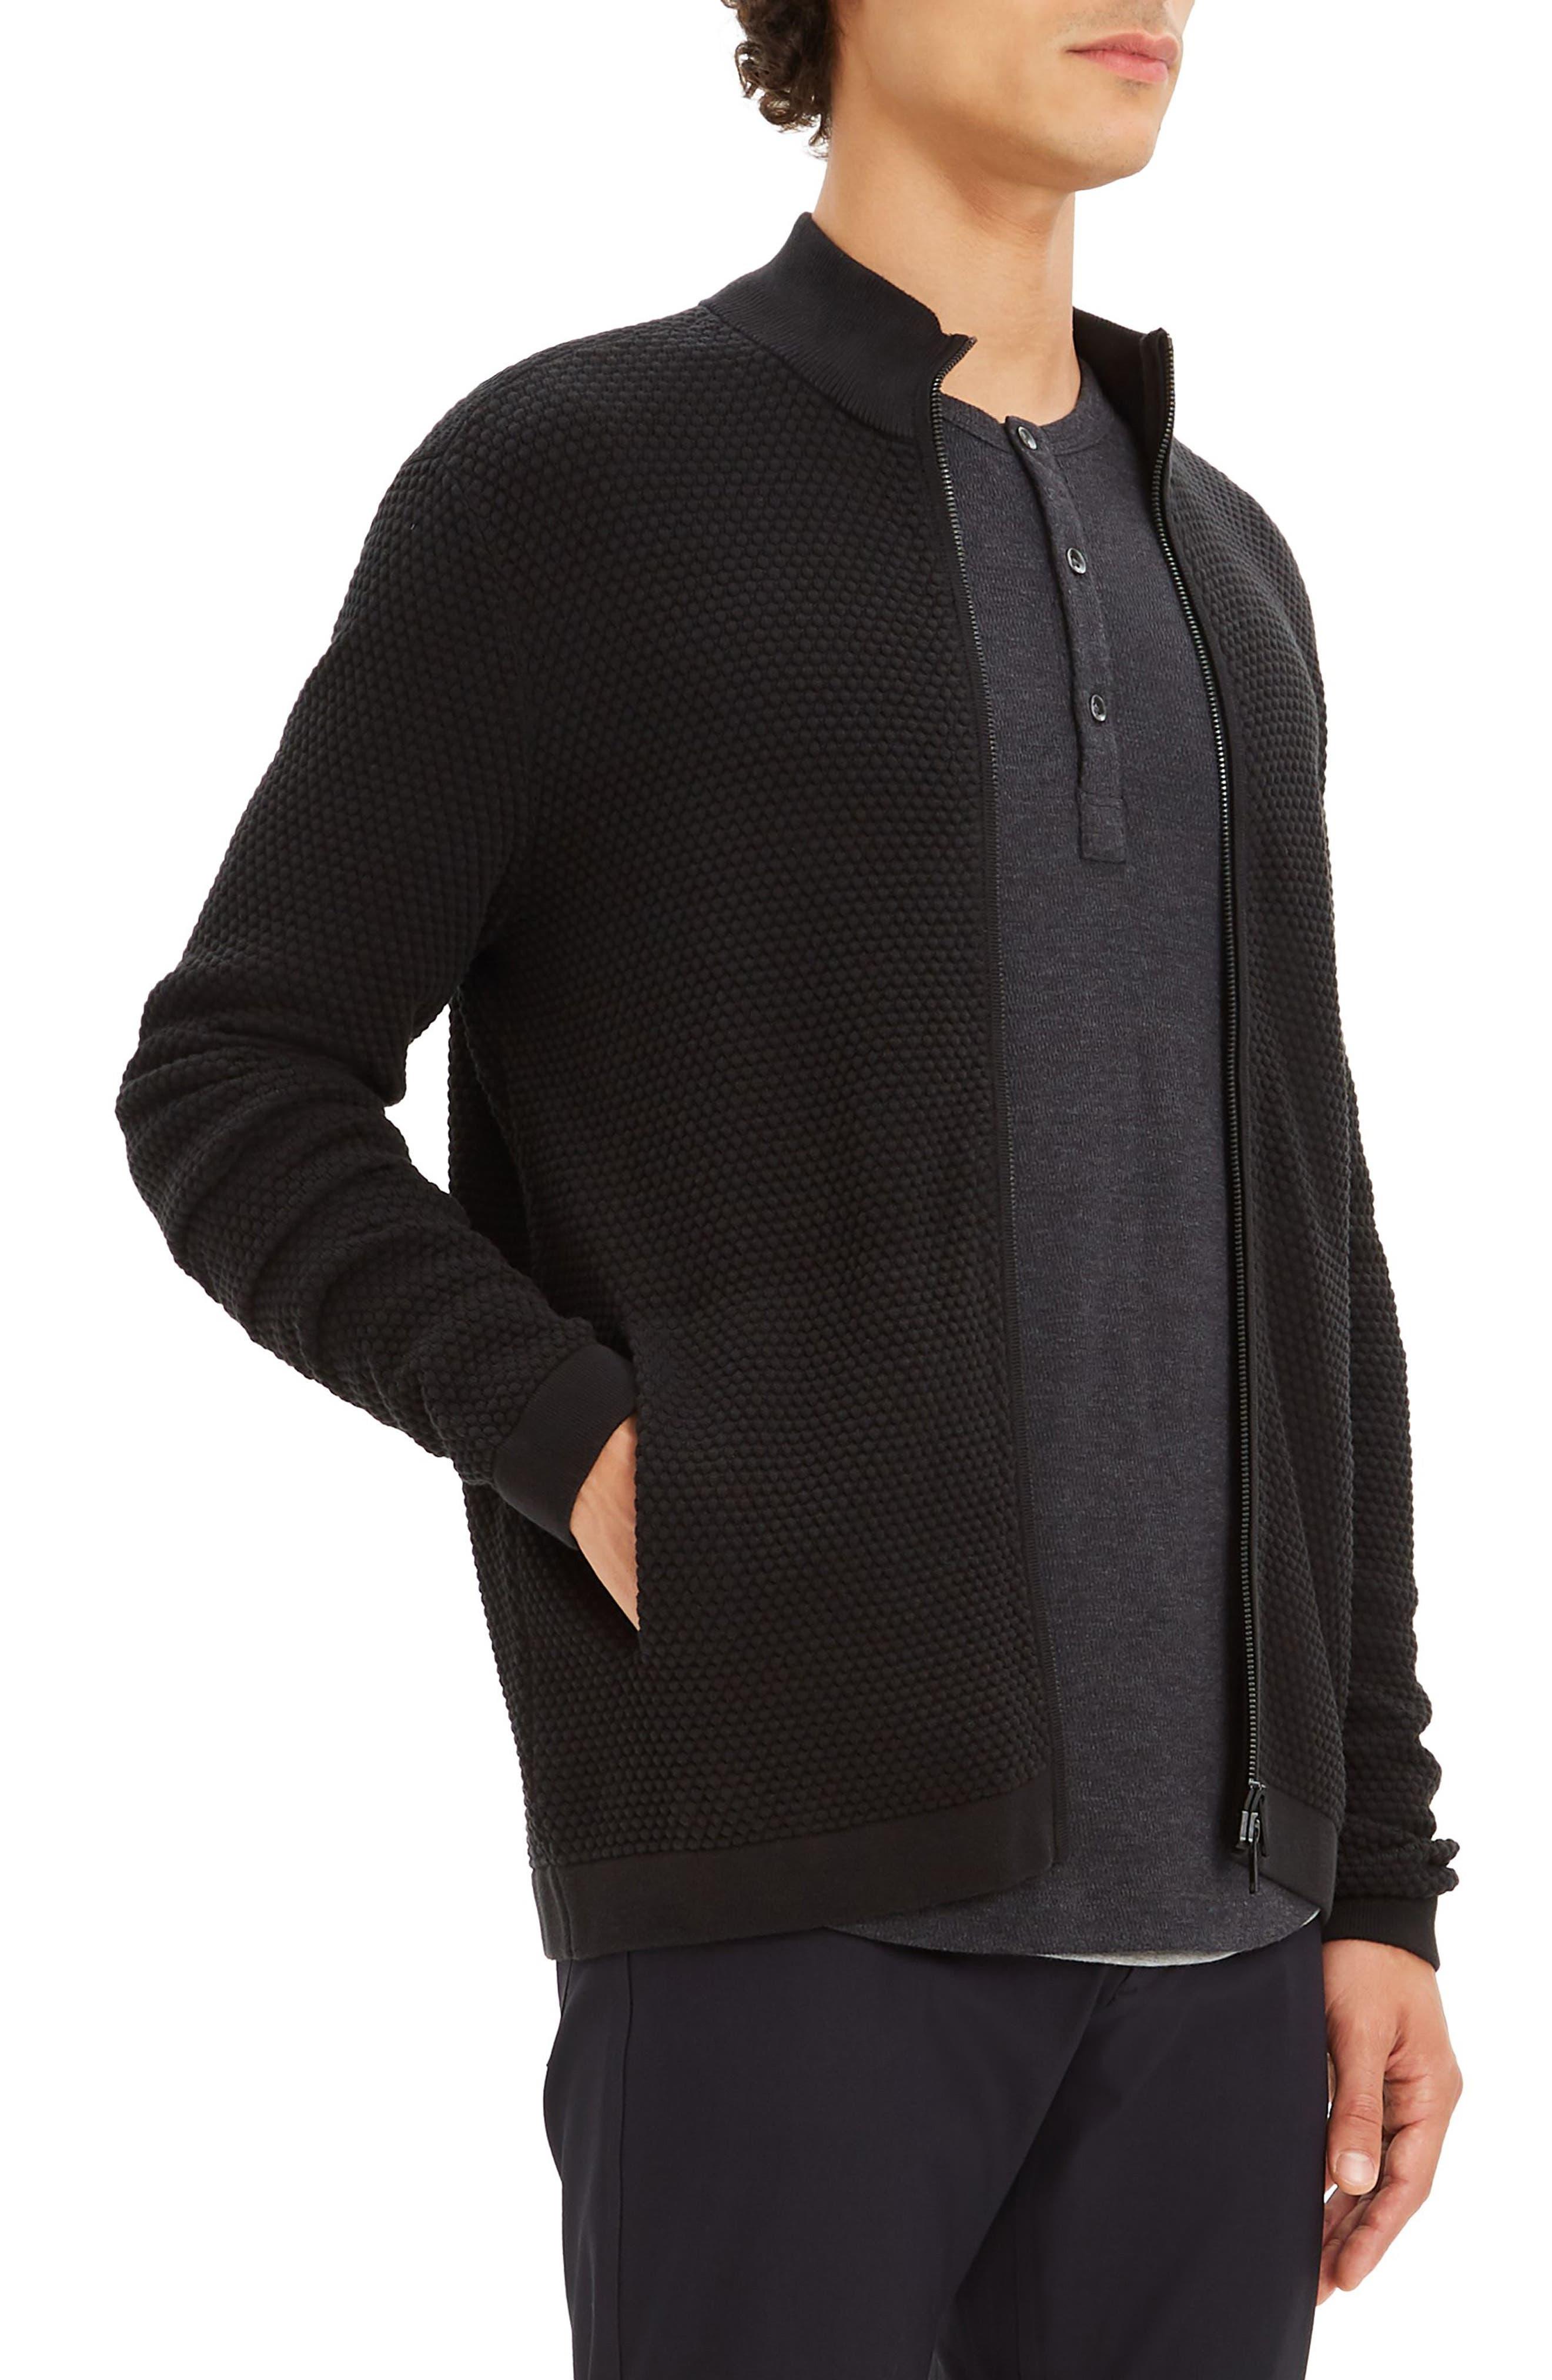 Udeval Breach Regular Fit Zip Sweater,                             Alternate thumbnail 3, color,                             BLACK